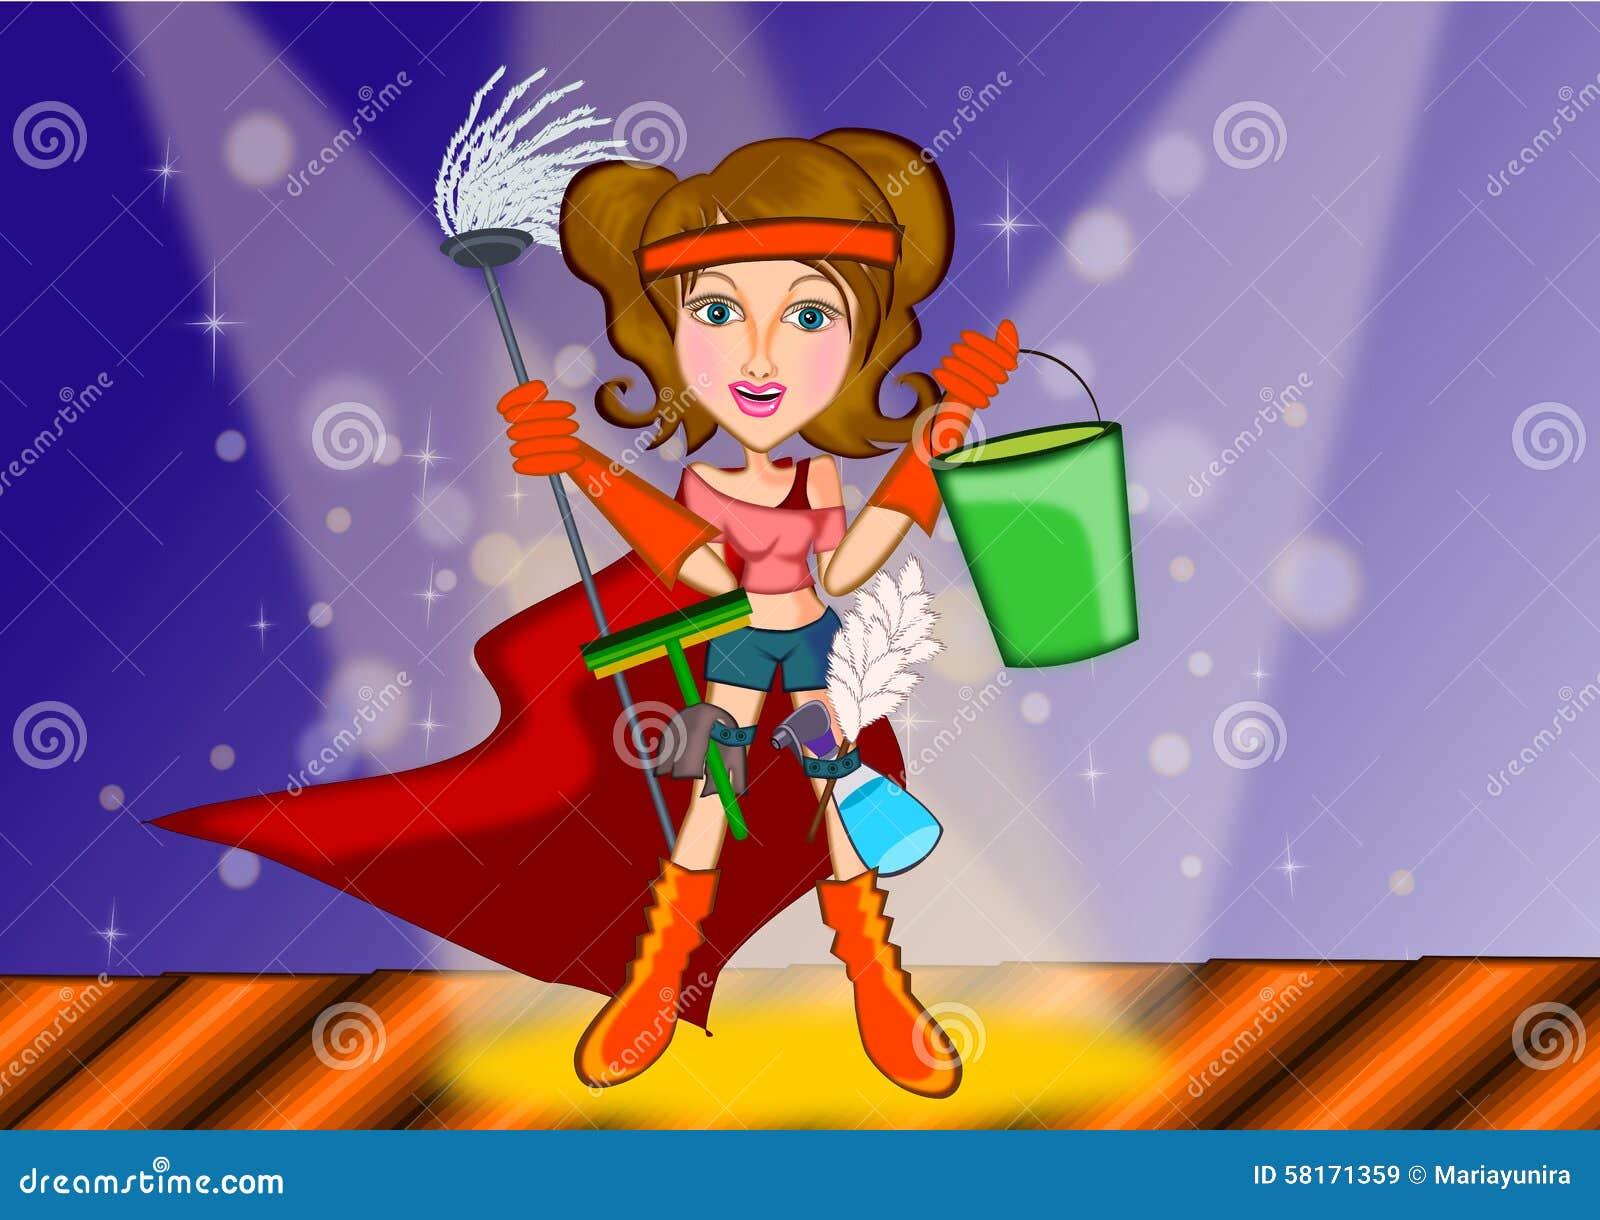 woman cleaning in superhero concept stock illustration little girl superhero clipart little girl superhero clipart